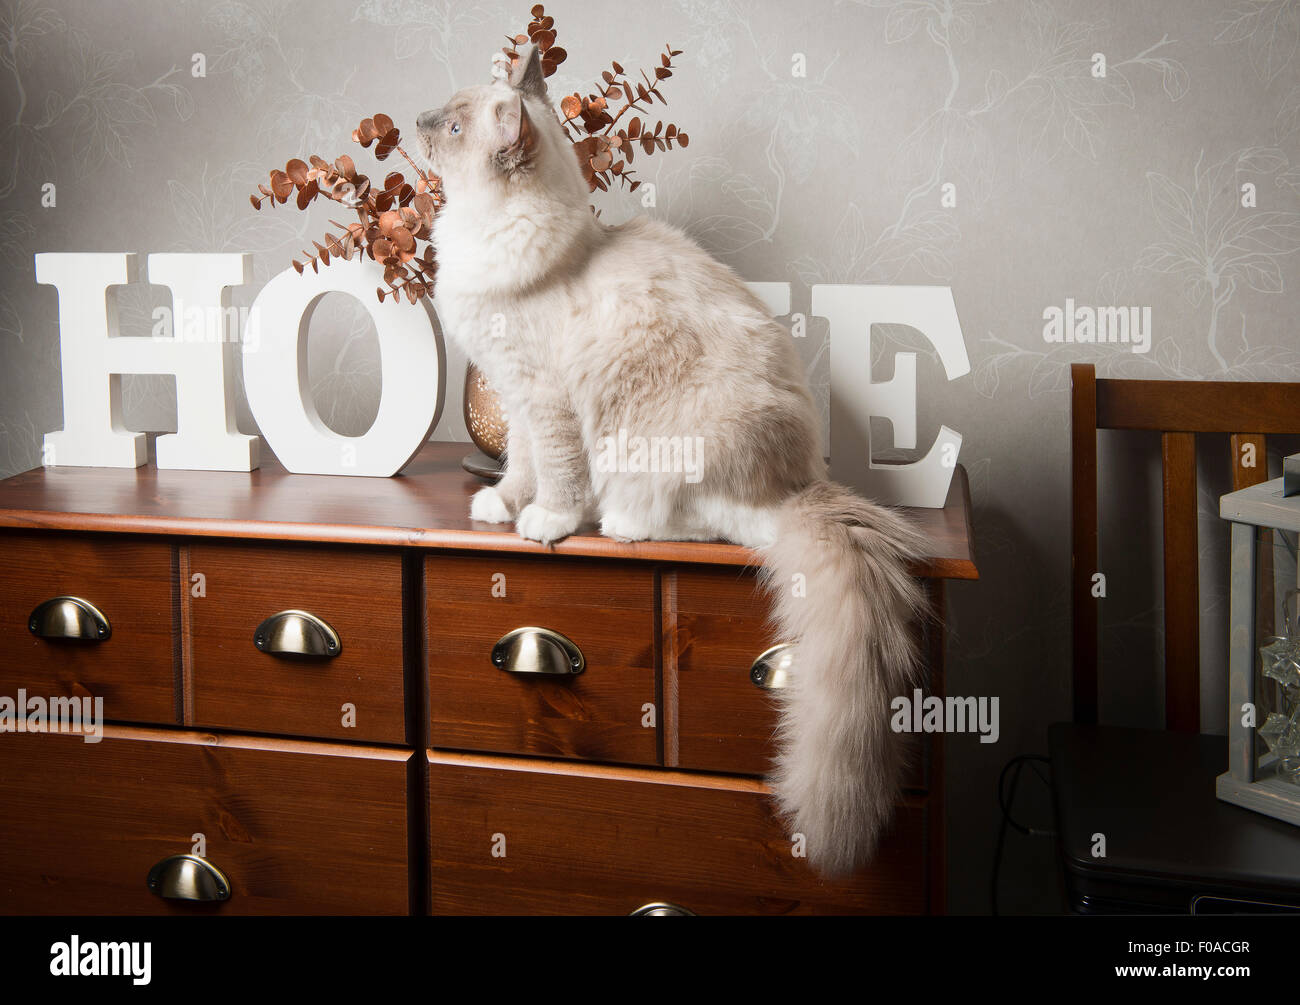 Gato Ragdoll sentado en aparador Imagen De Stock